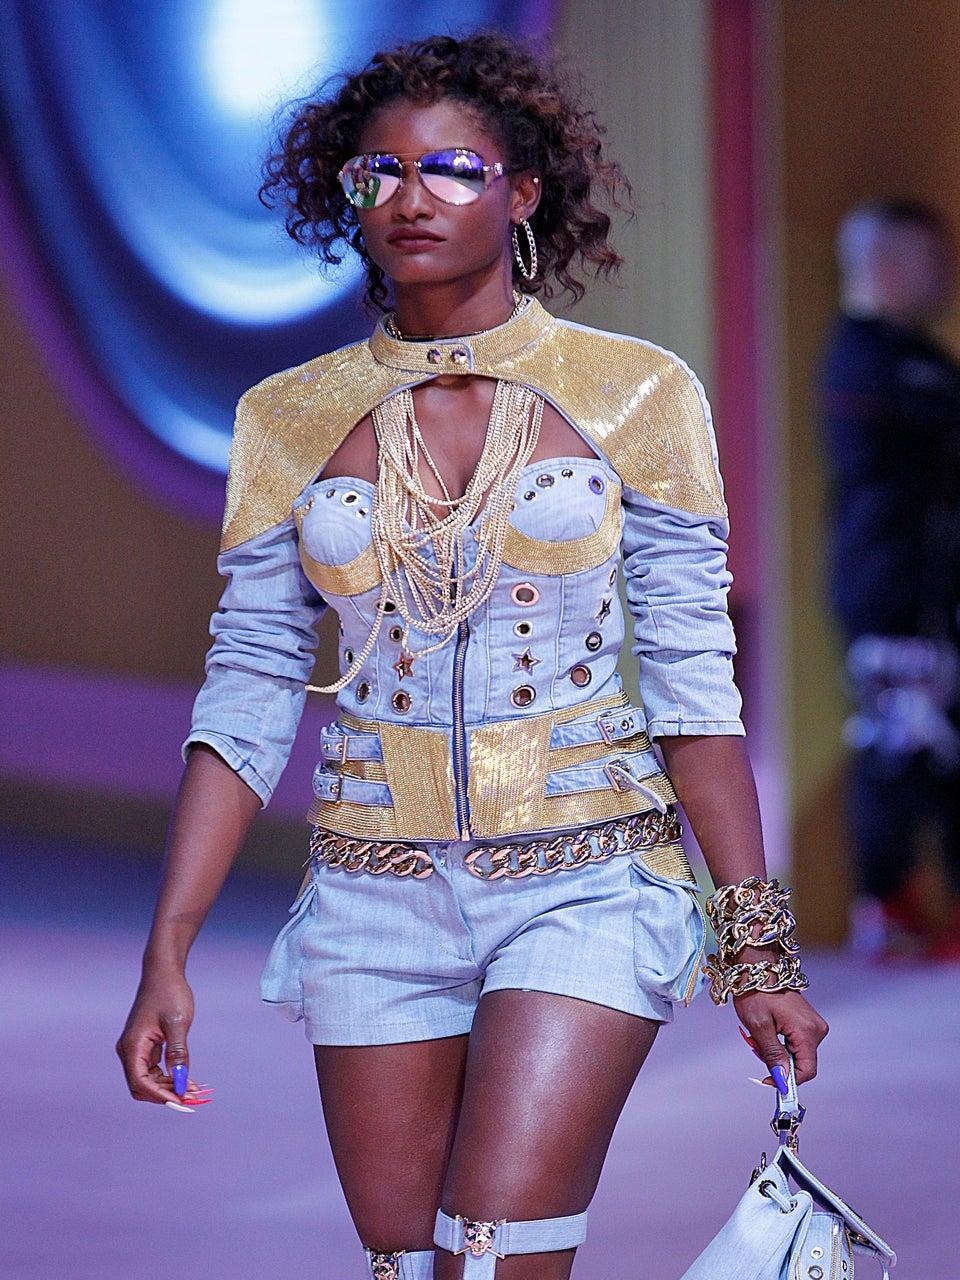 Philipp Plein Hit Milan Fashion Week With 'Alice in Ghettoland' Themed Show